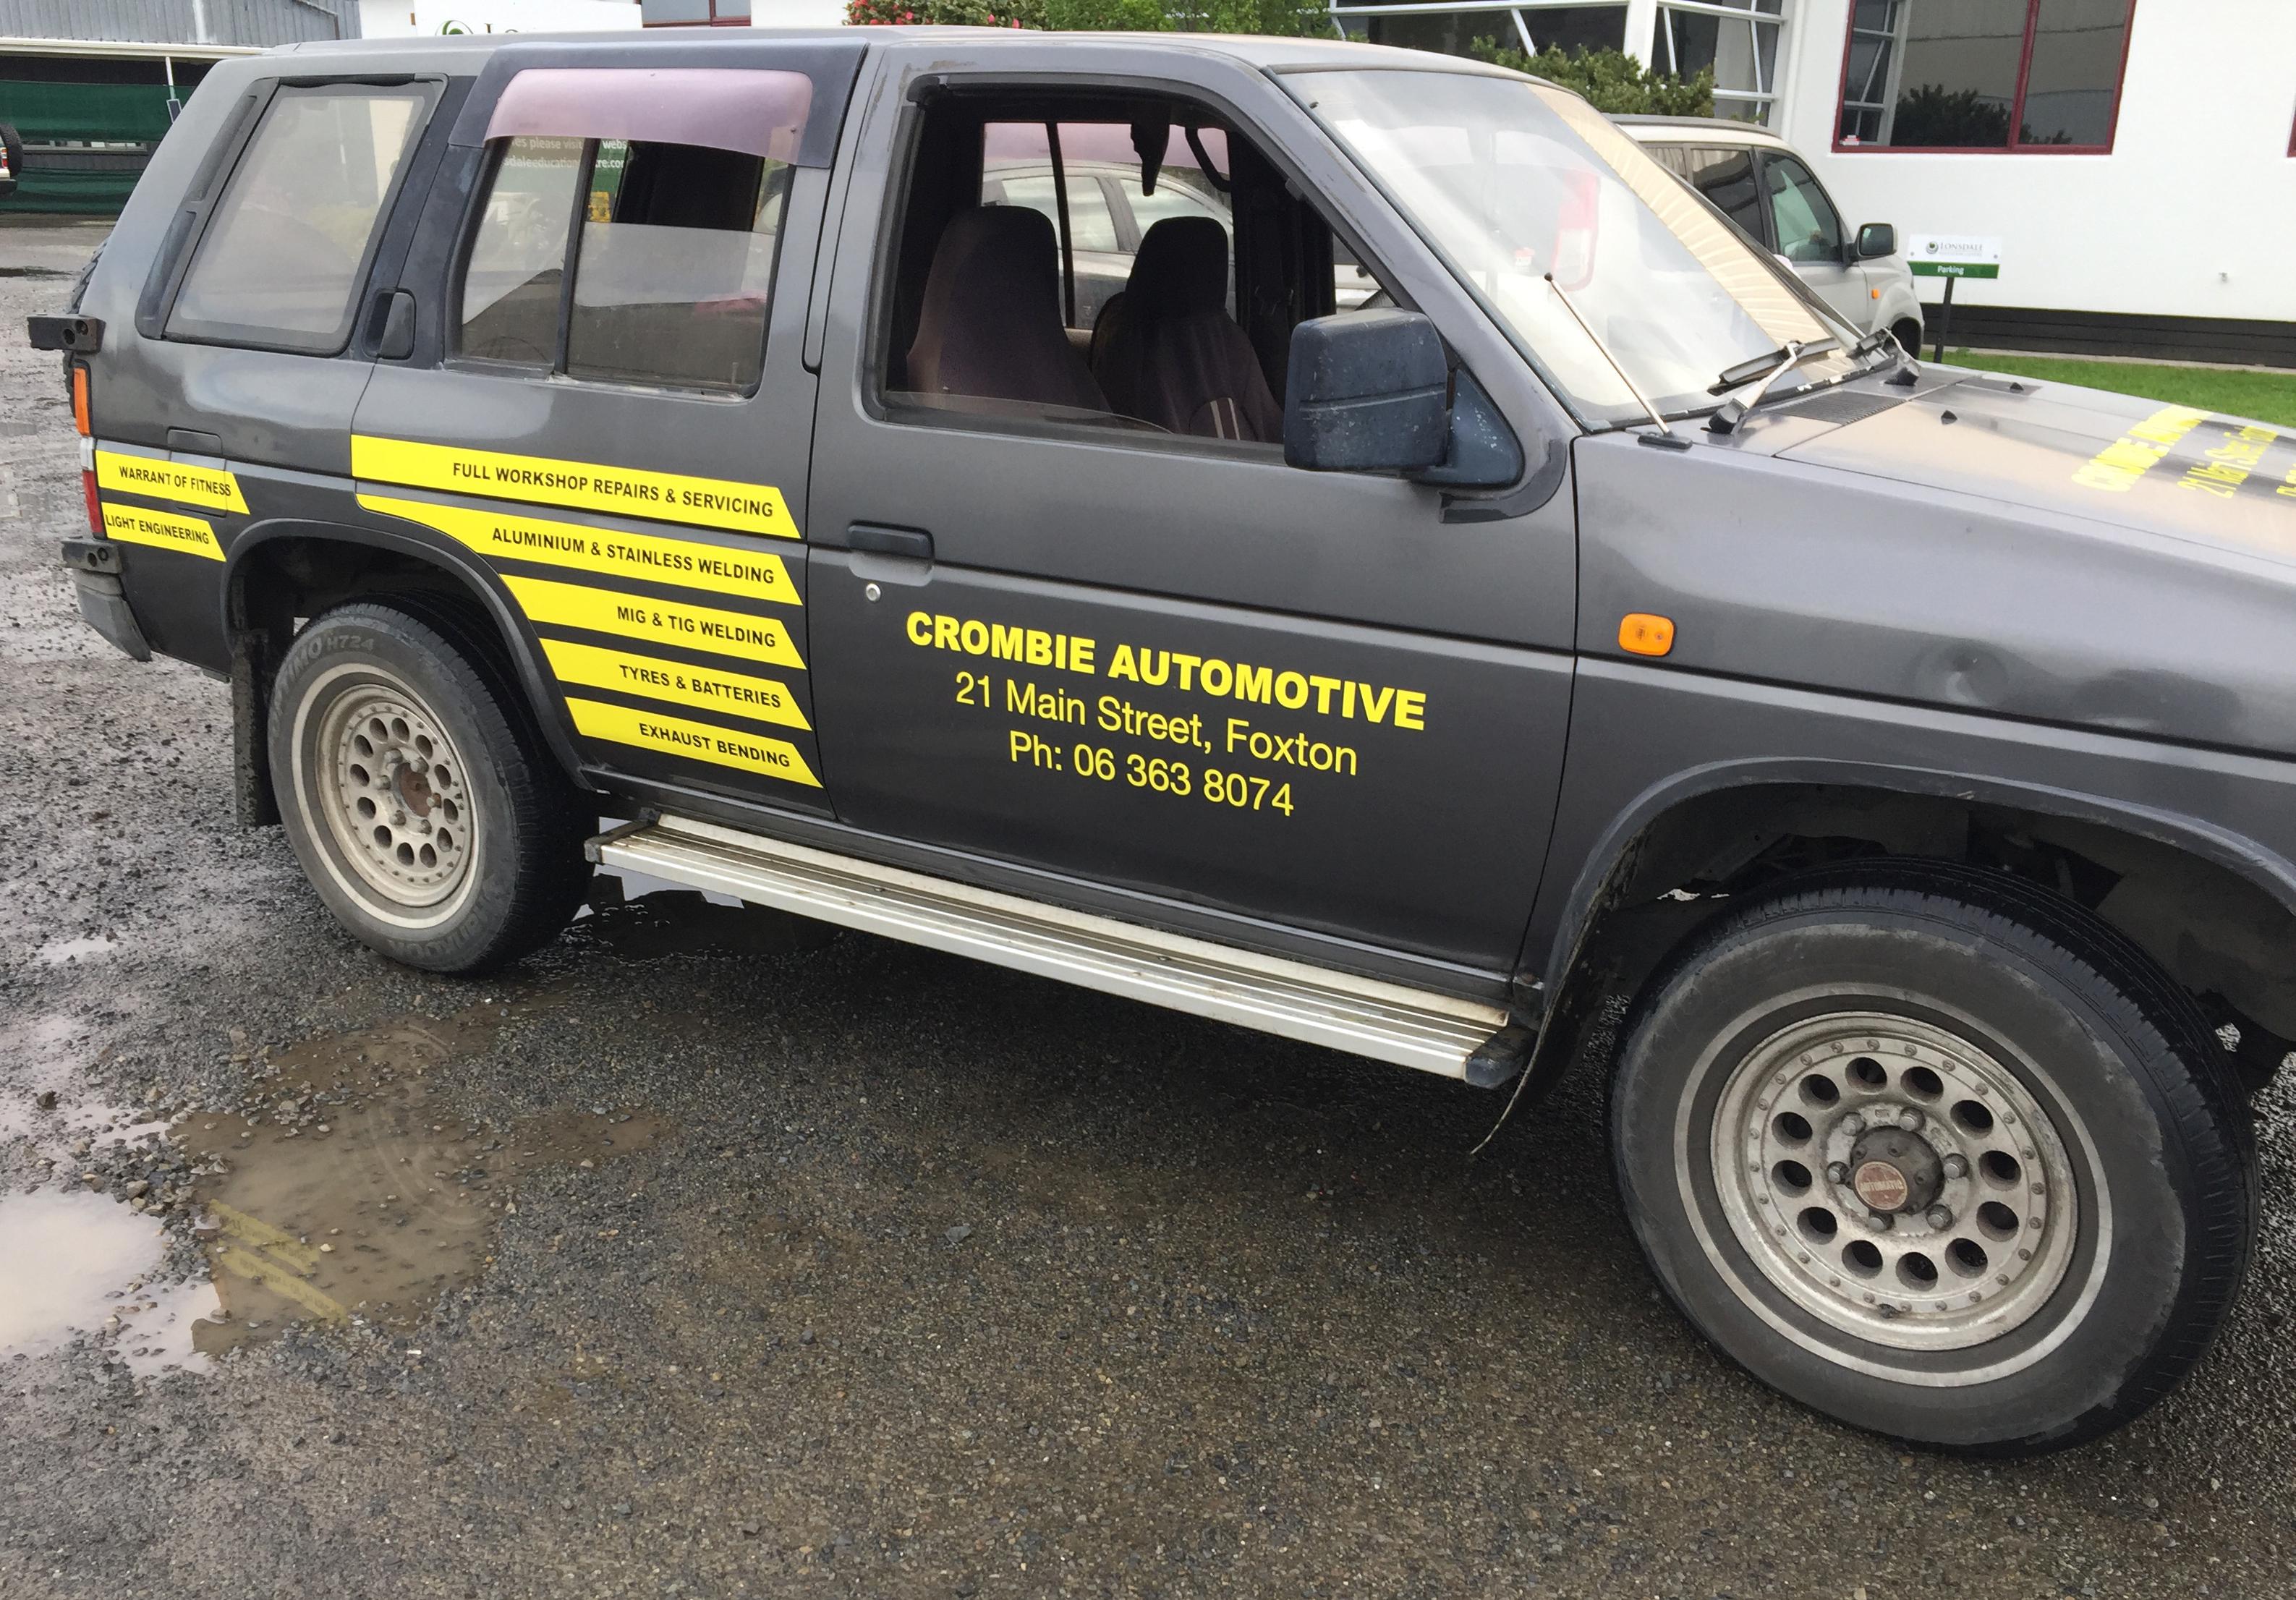 Crombie_Automotive